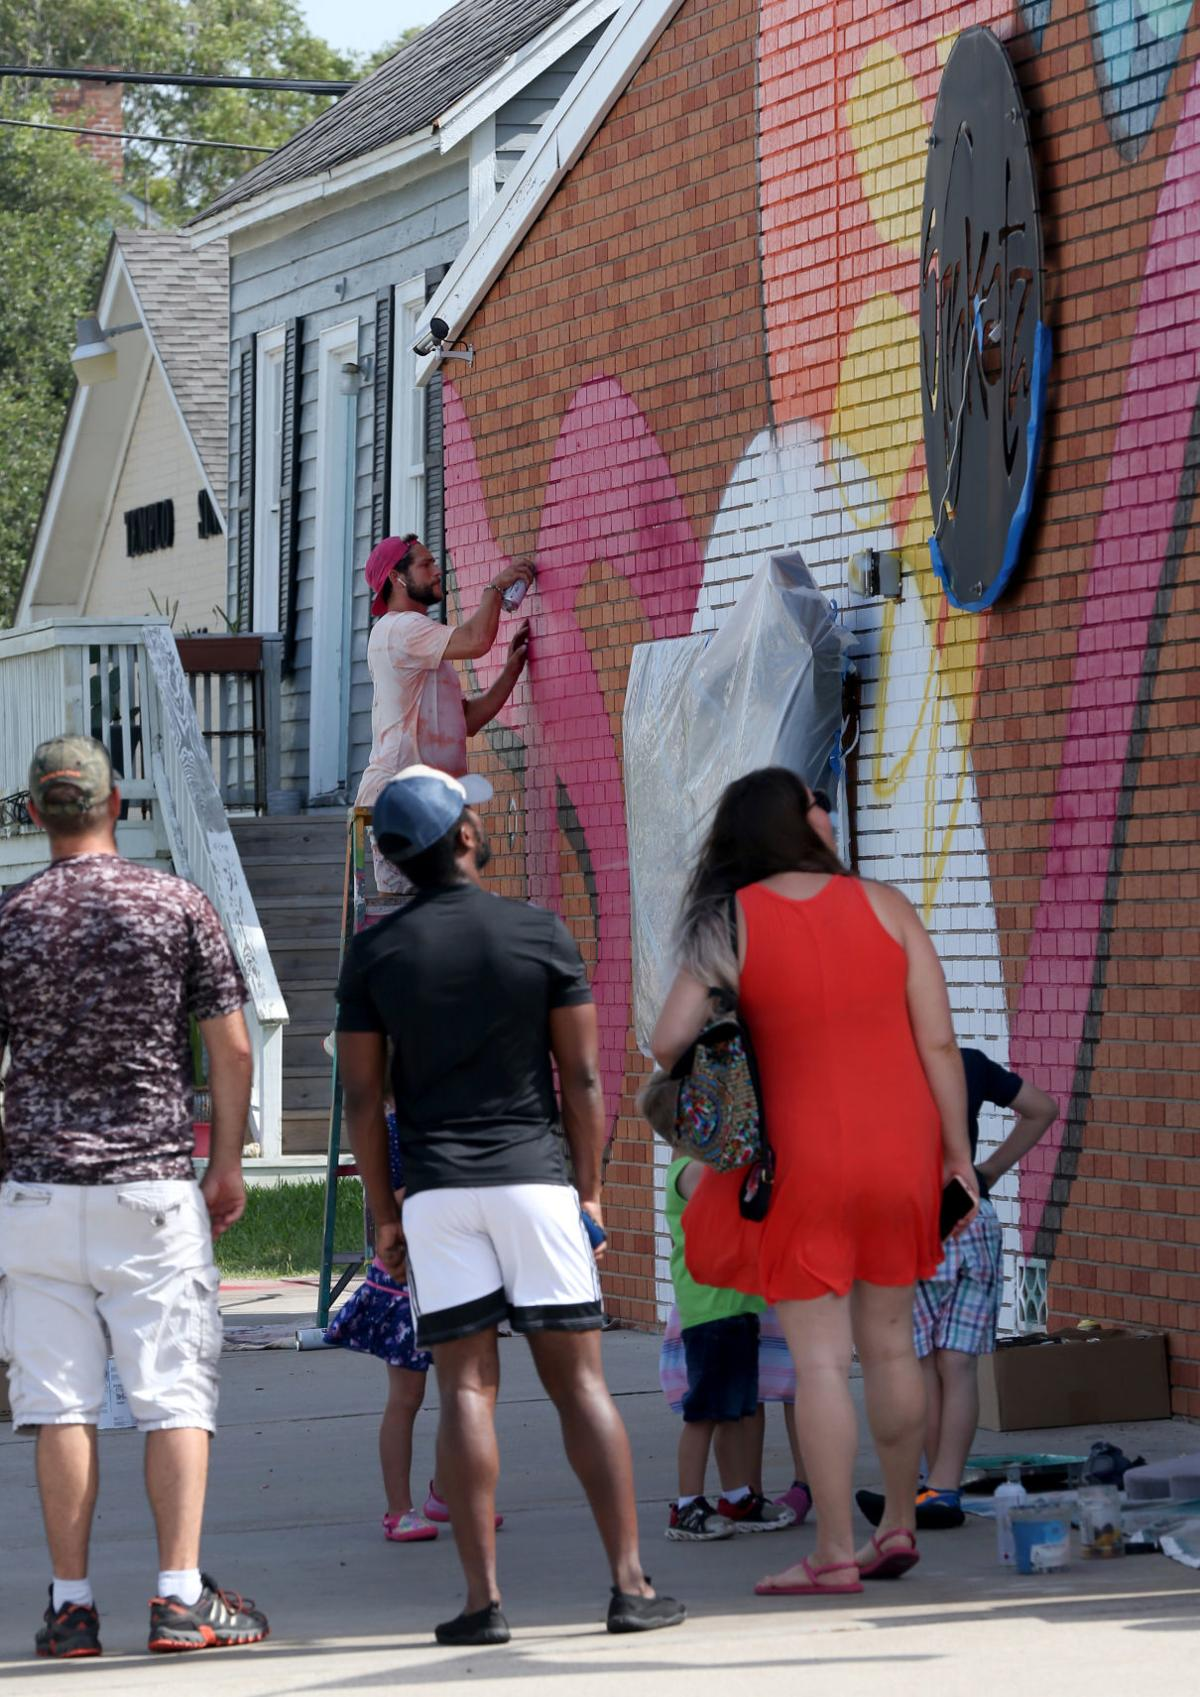 Artist paints mural on side of island restaurant